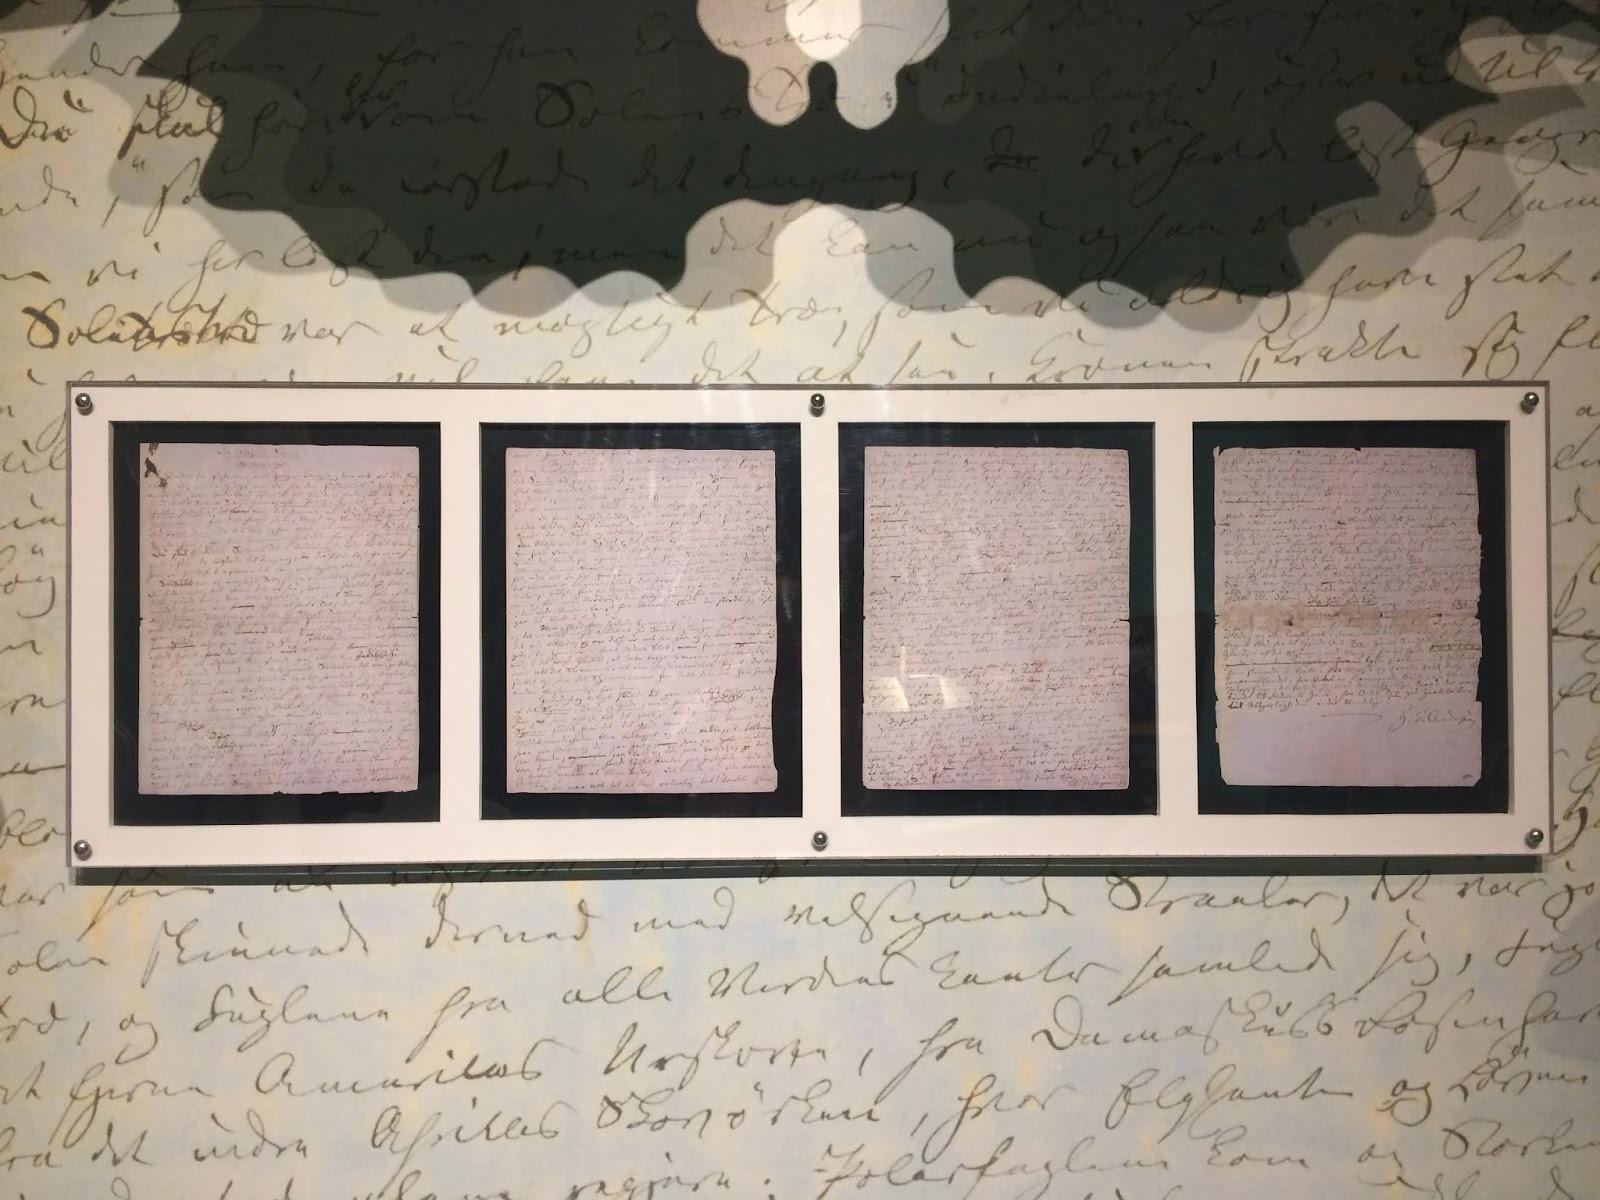 Handwritten story by Hans Christian Andersen